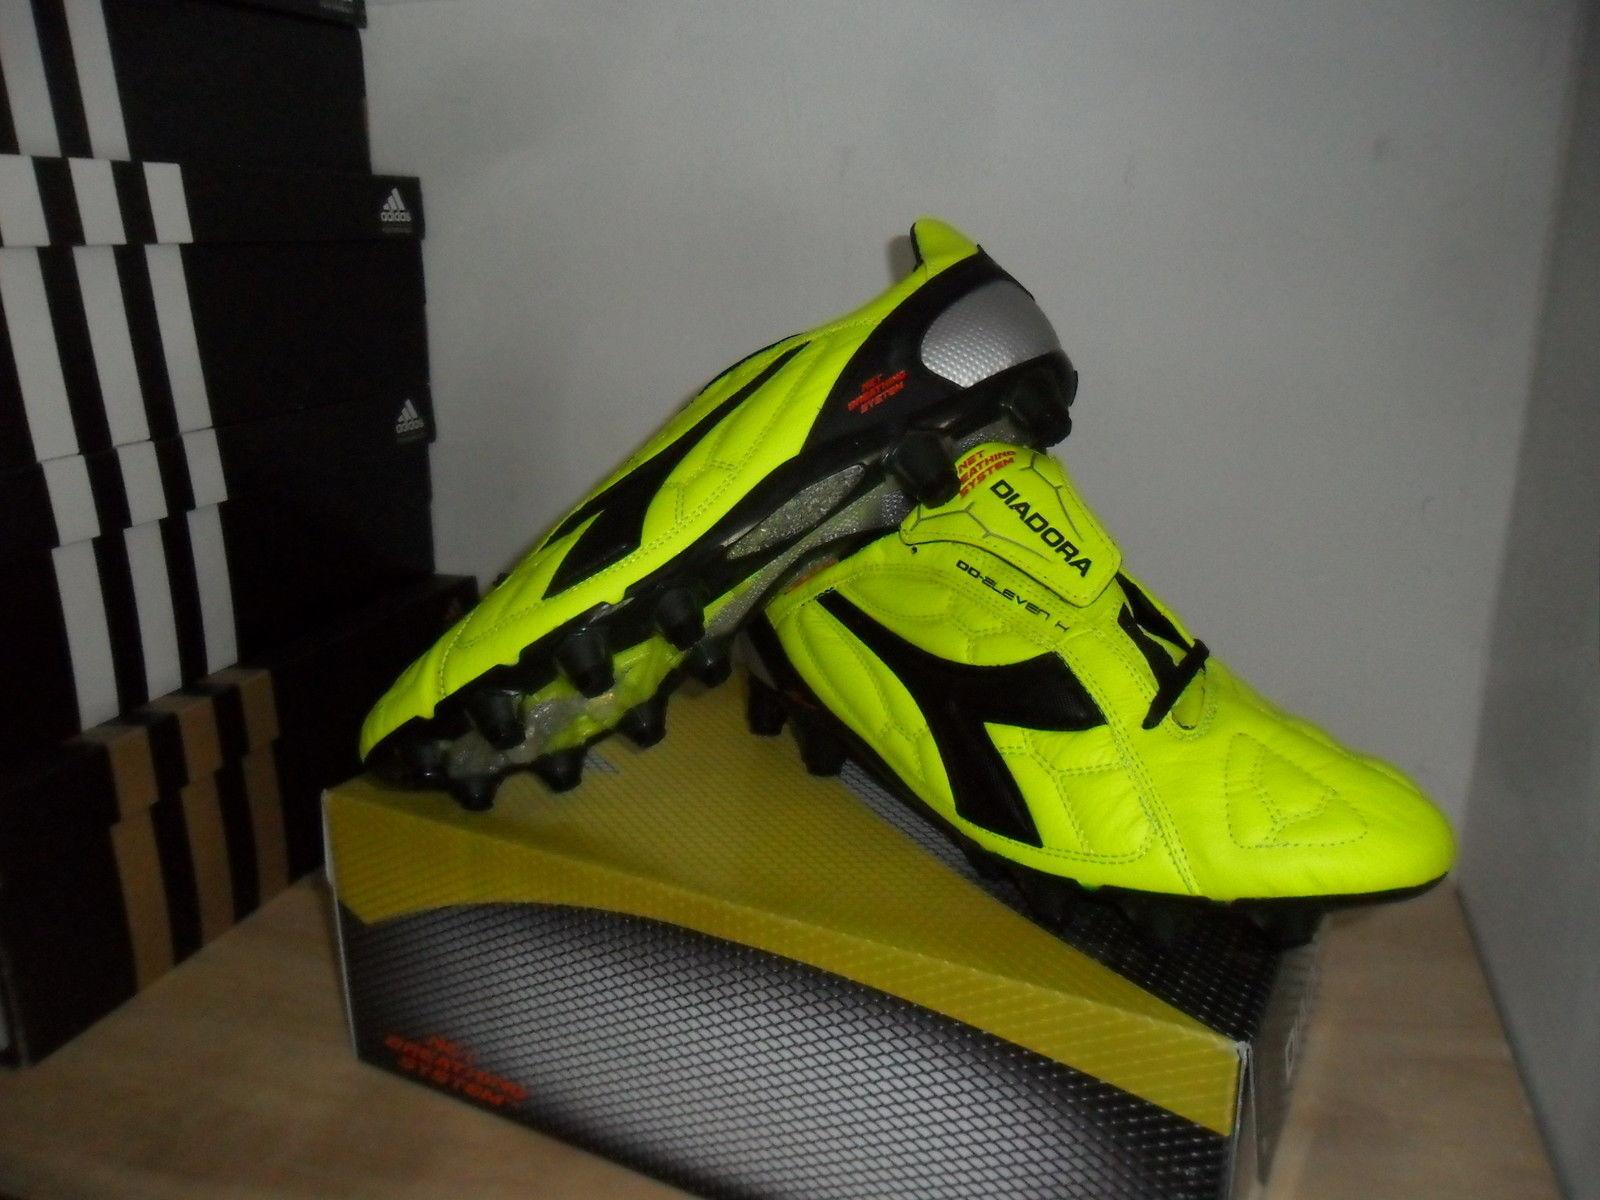 Fw17 Diadora Soccer DD-Eleven K gx14 Soccer chaussures Football démarrage 155978 c0001